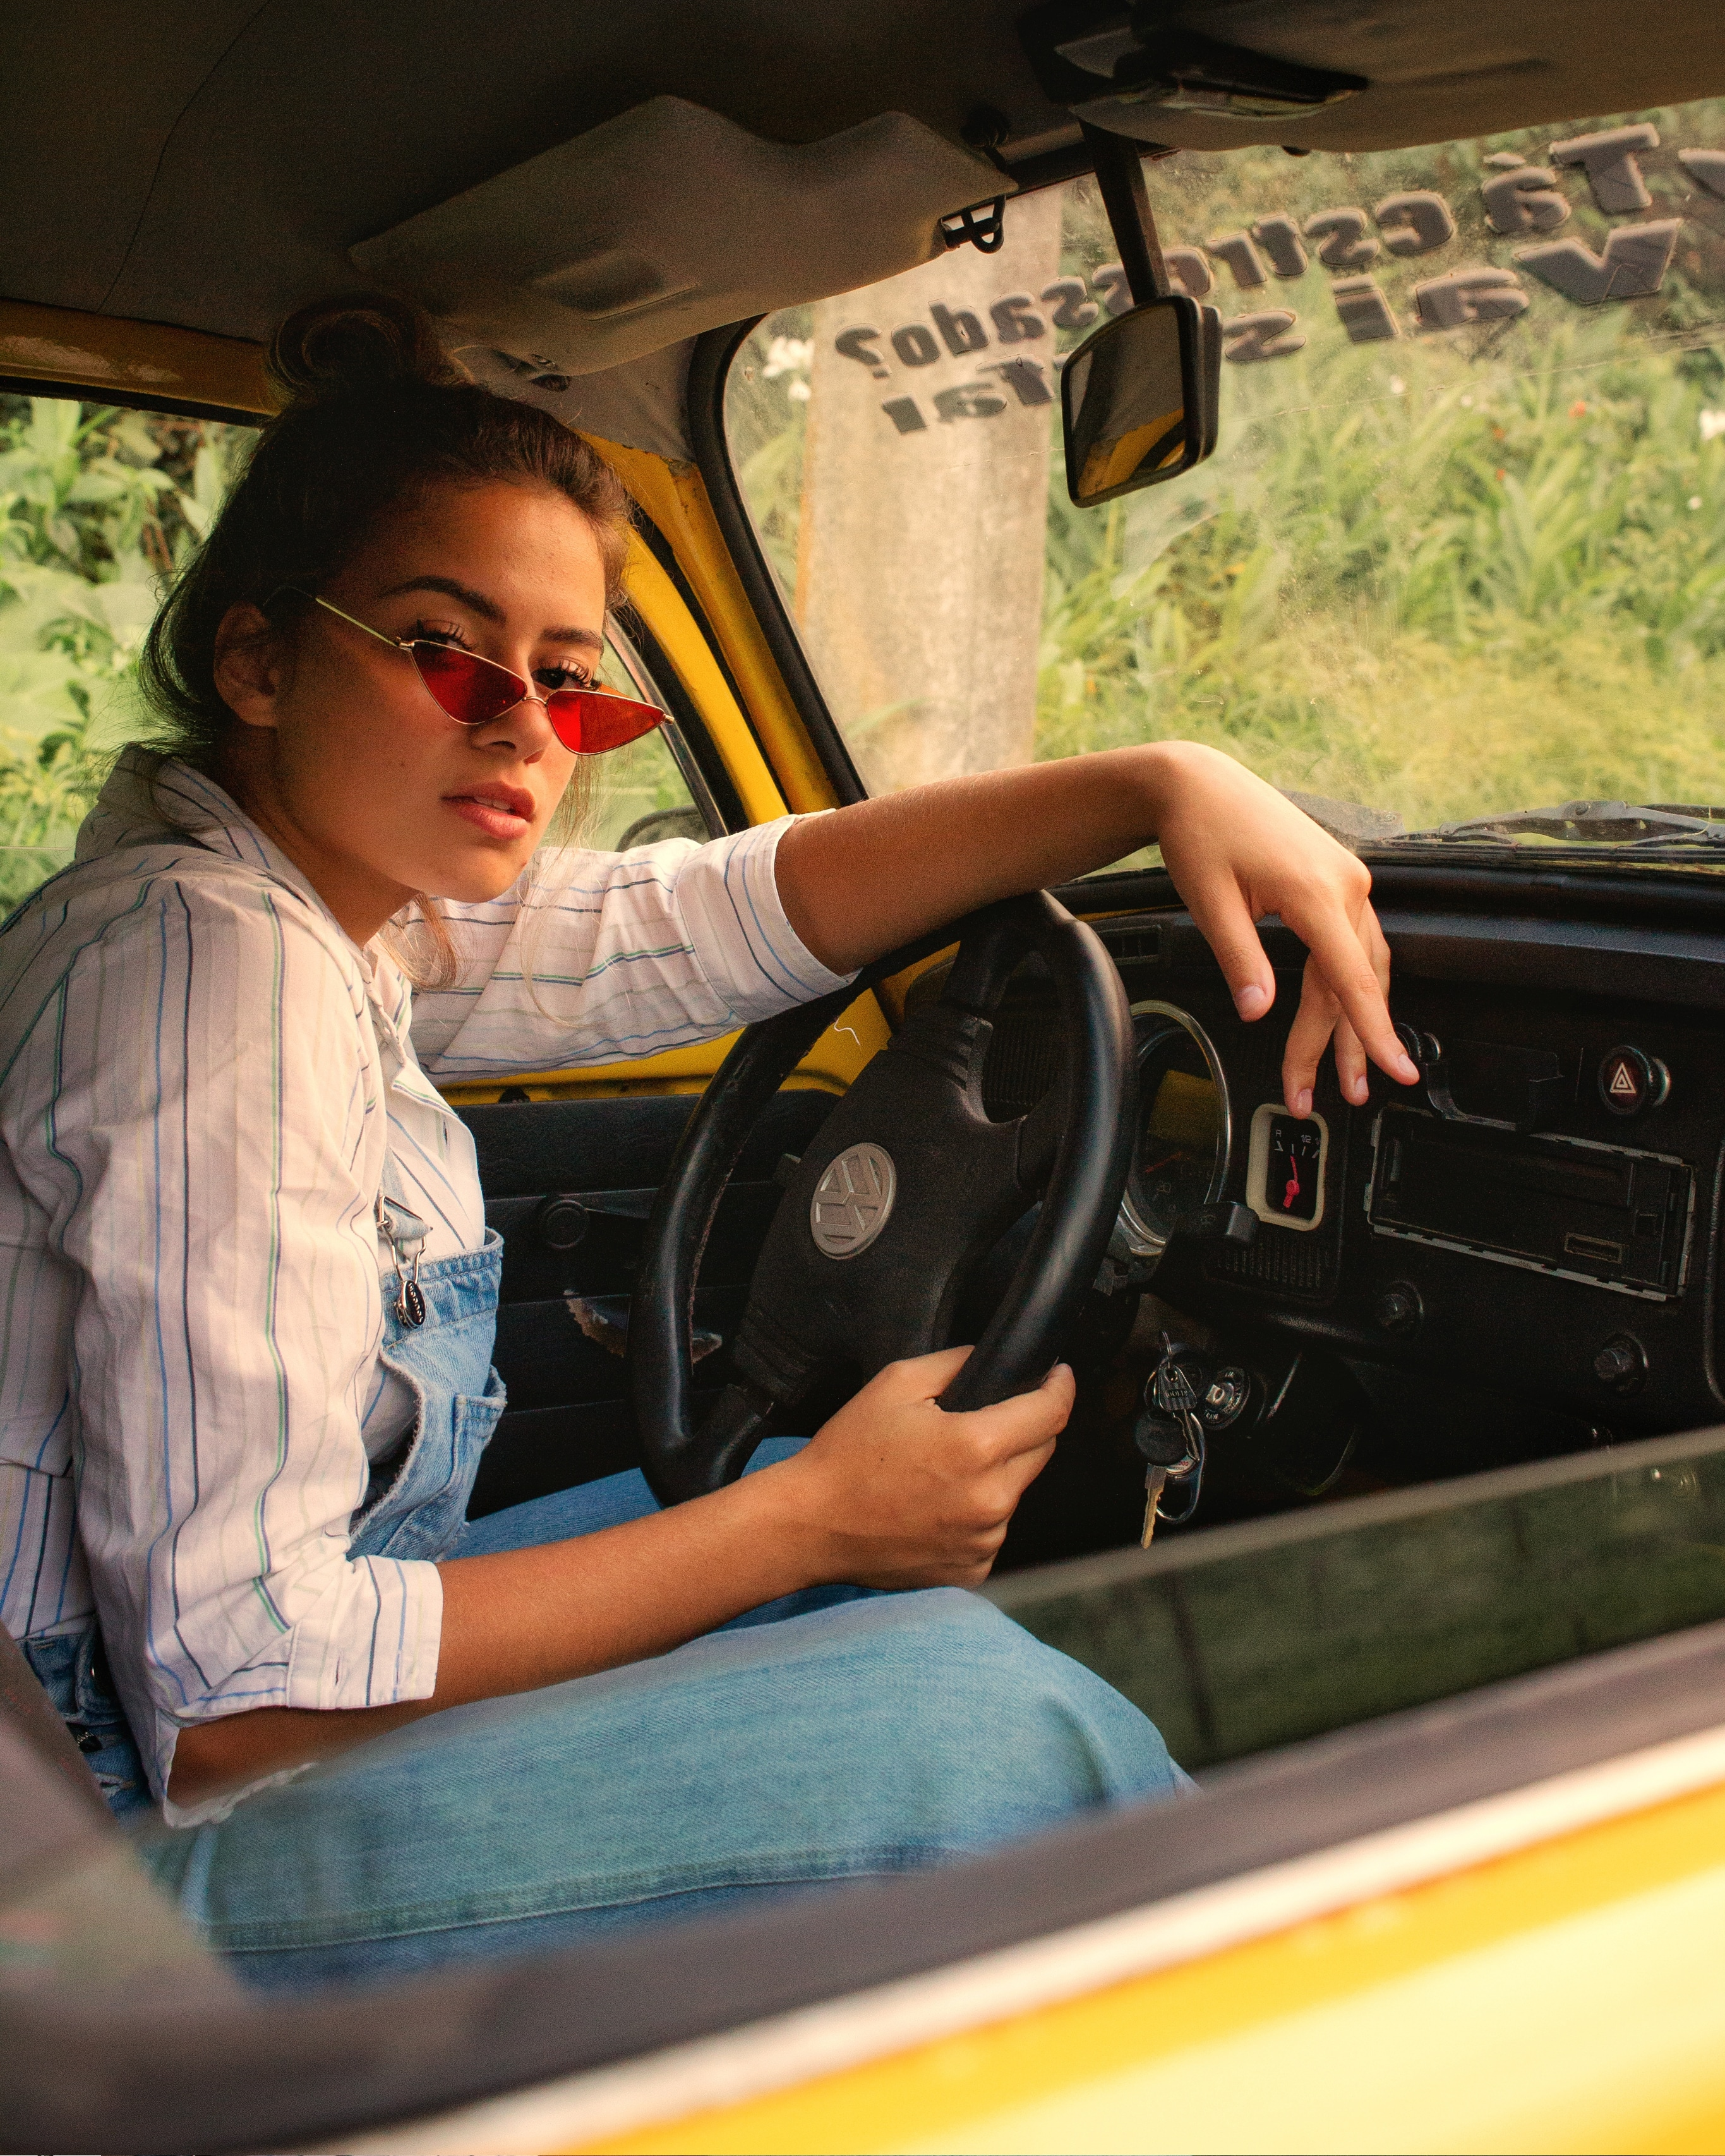 Woman Riding Inside Car